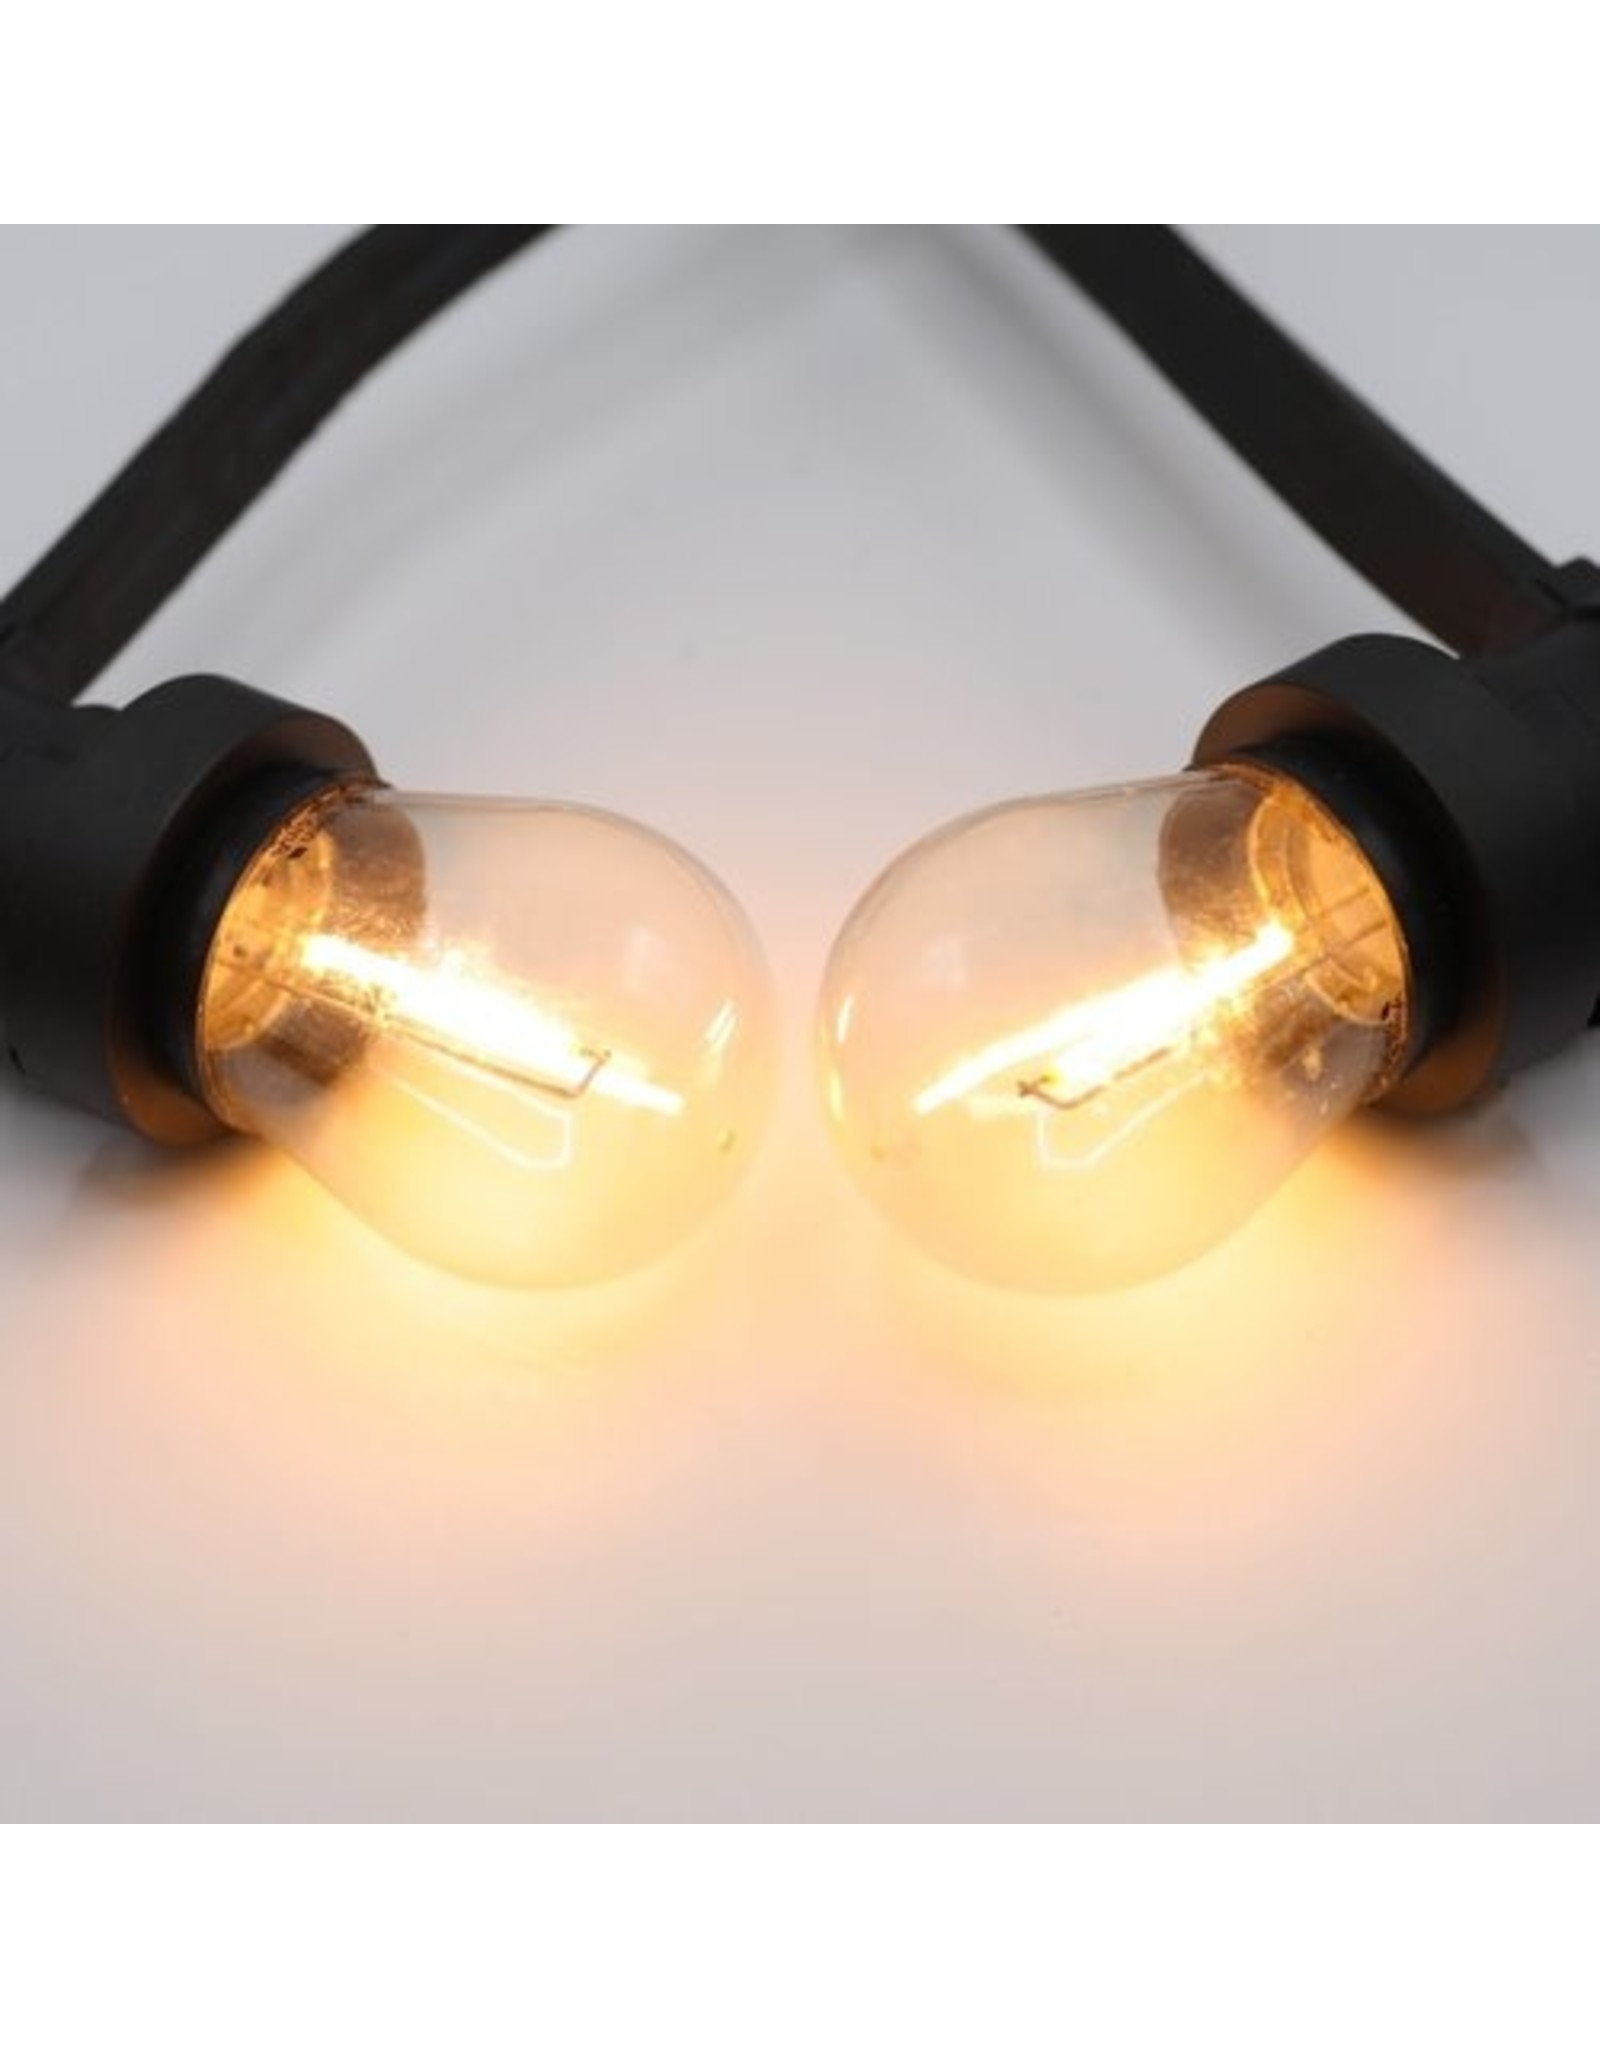 Lights guirlande Warm witte filament lampen - 1 Watt  2700K (gloeilamp)